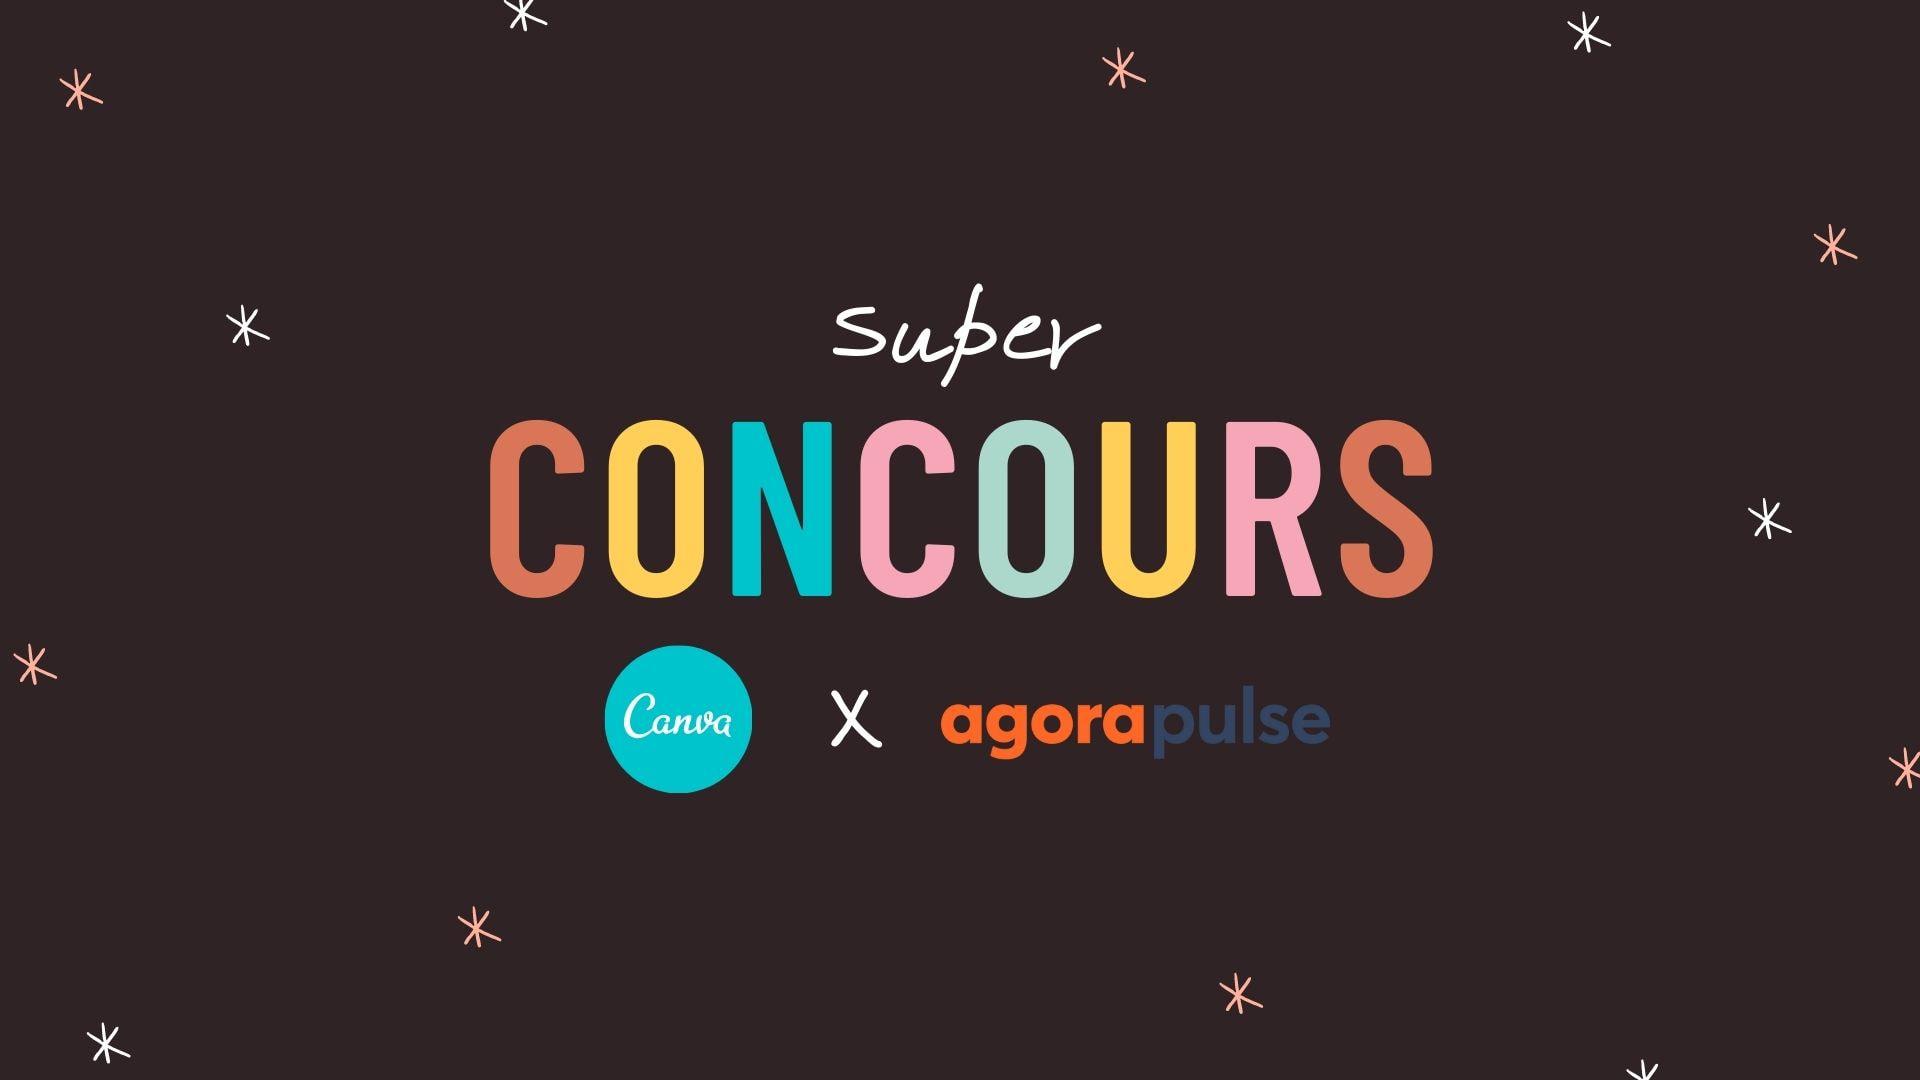 concours, Canva Agorapulse